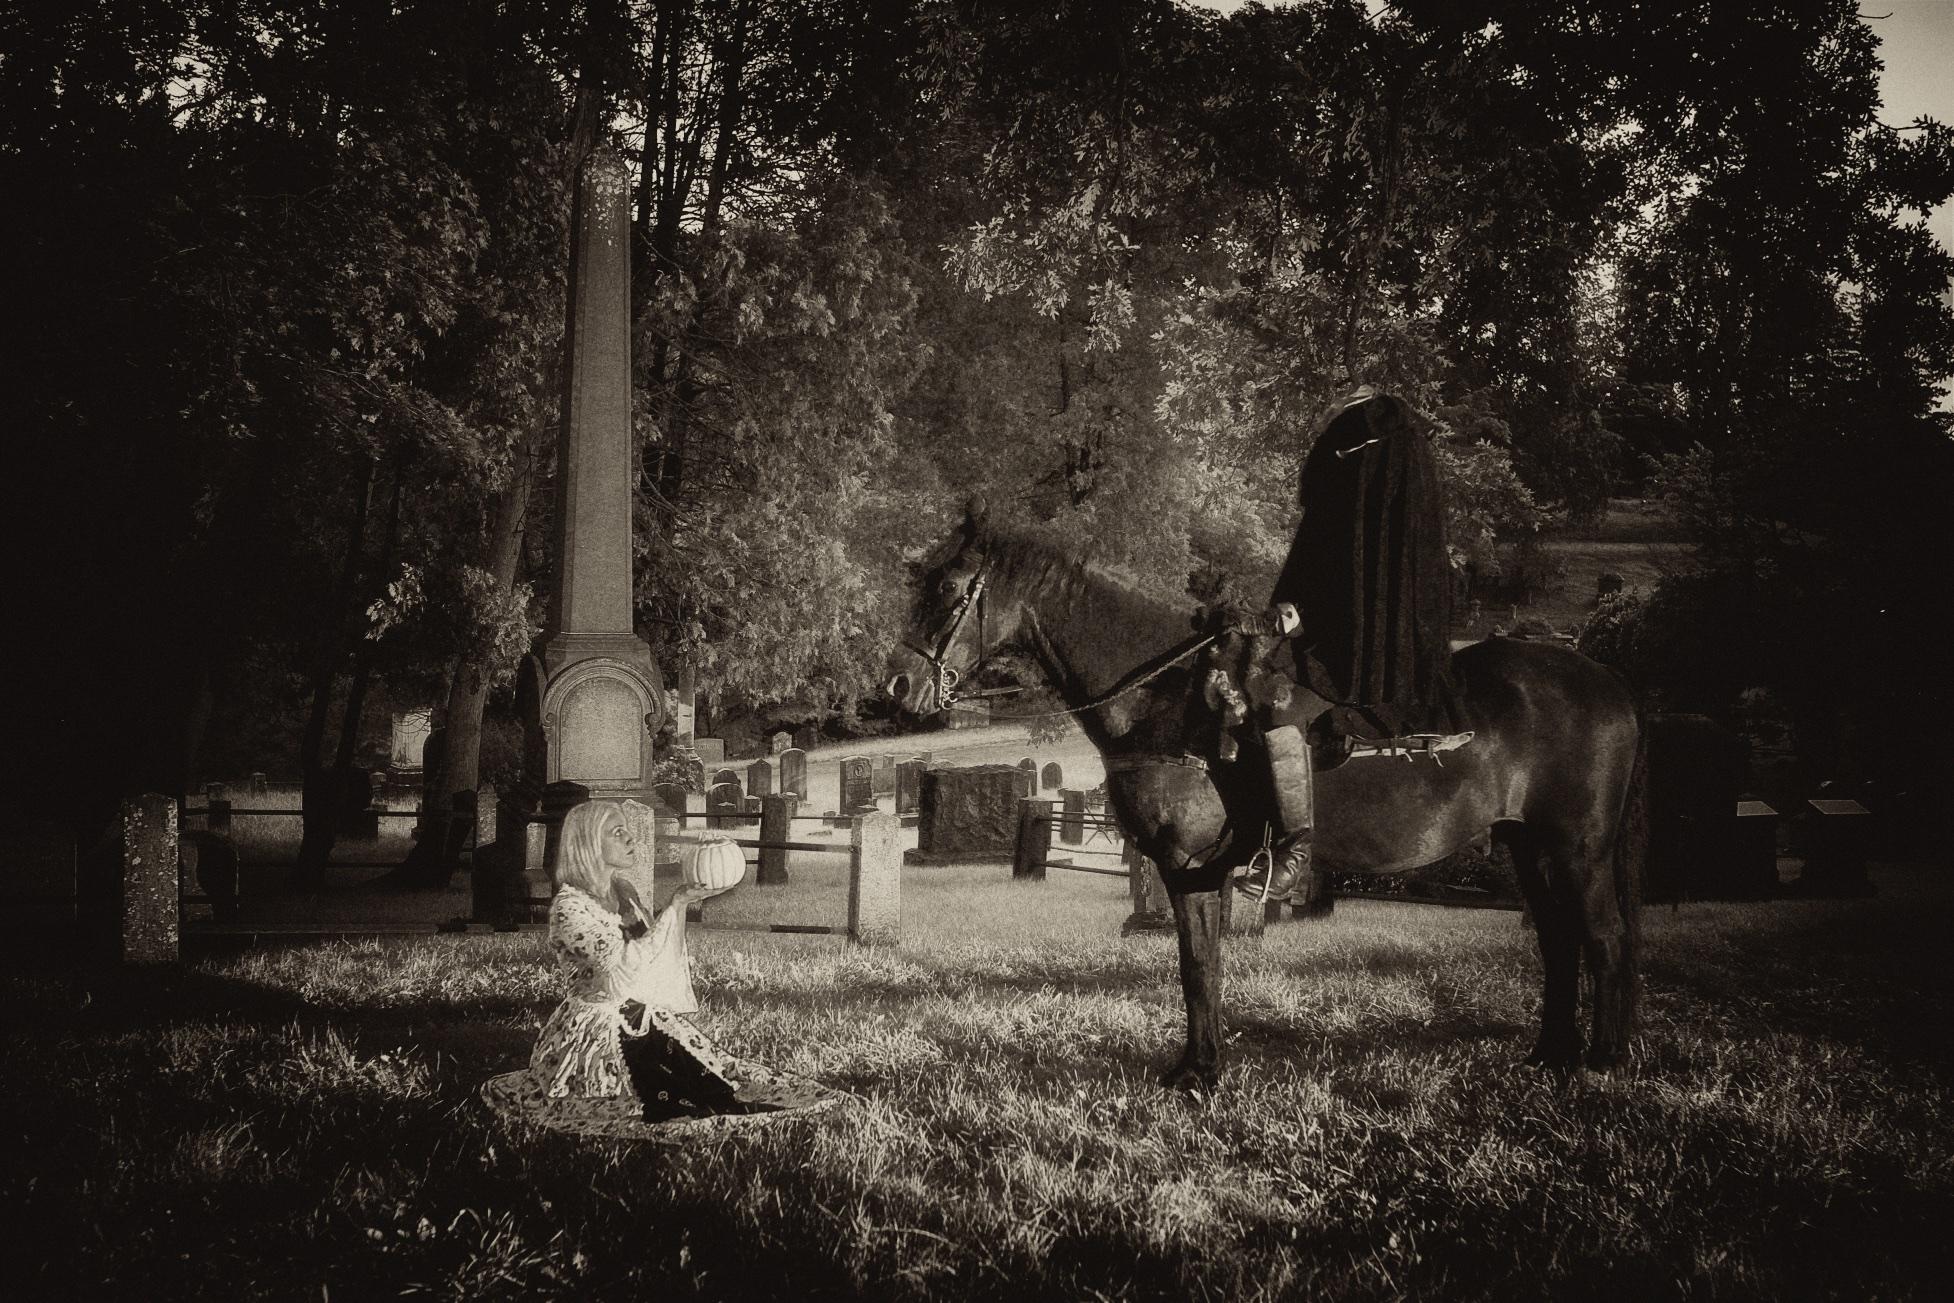 Headless horseman at Sleepy Hollow Cemetery with Katrina Van Tassel